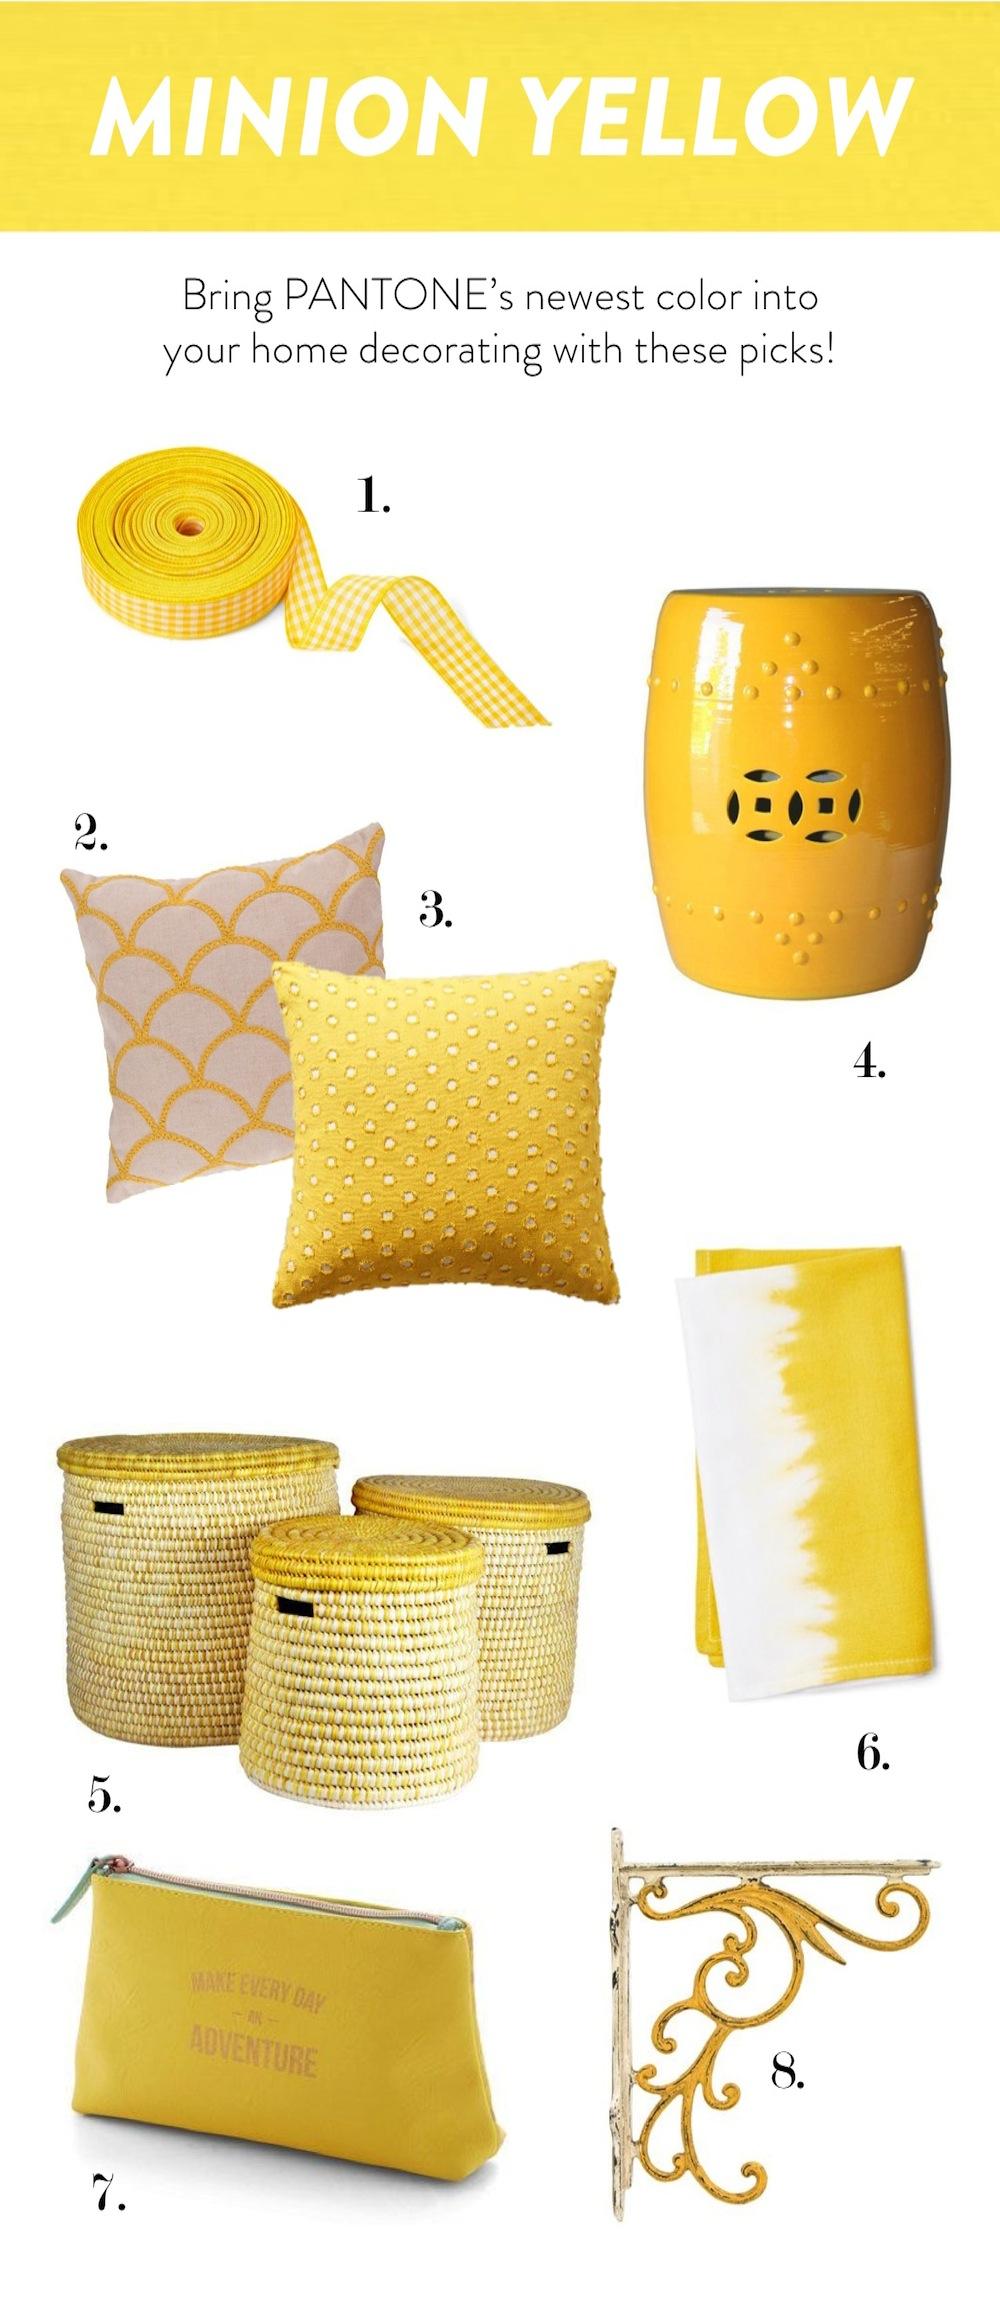 PANTONE Minion Yellow (Despicable Me) Home Decor Inspiration - Stevie Storck Design Co.